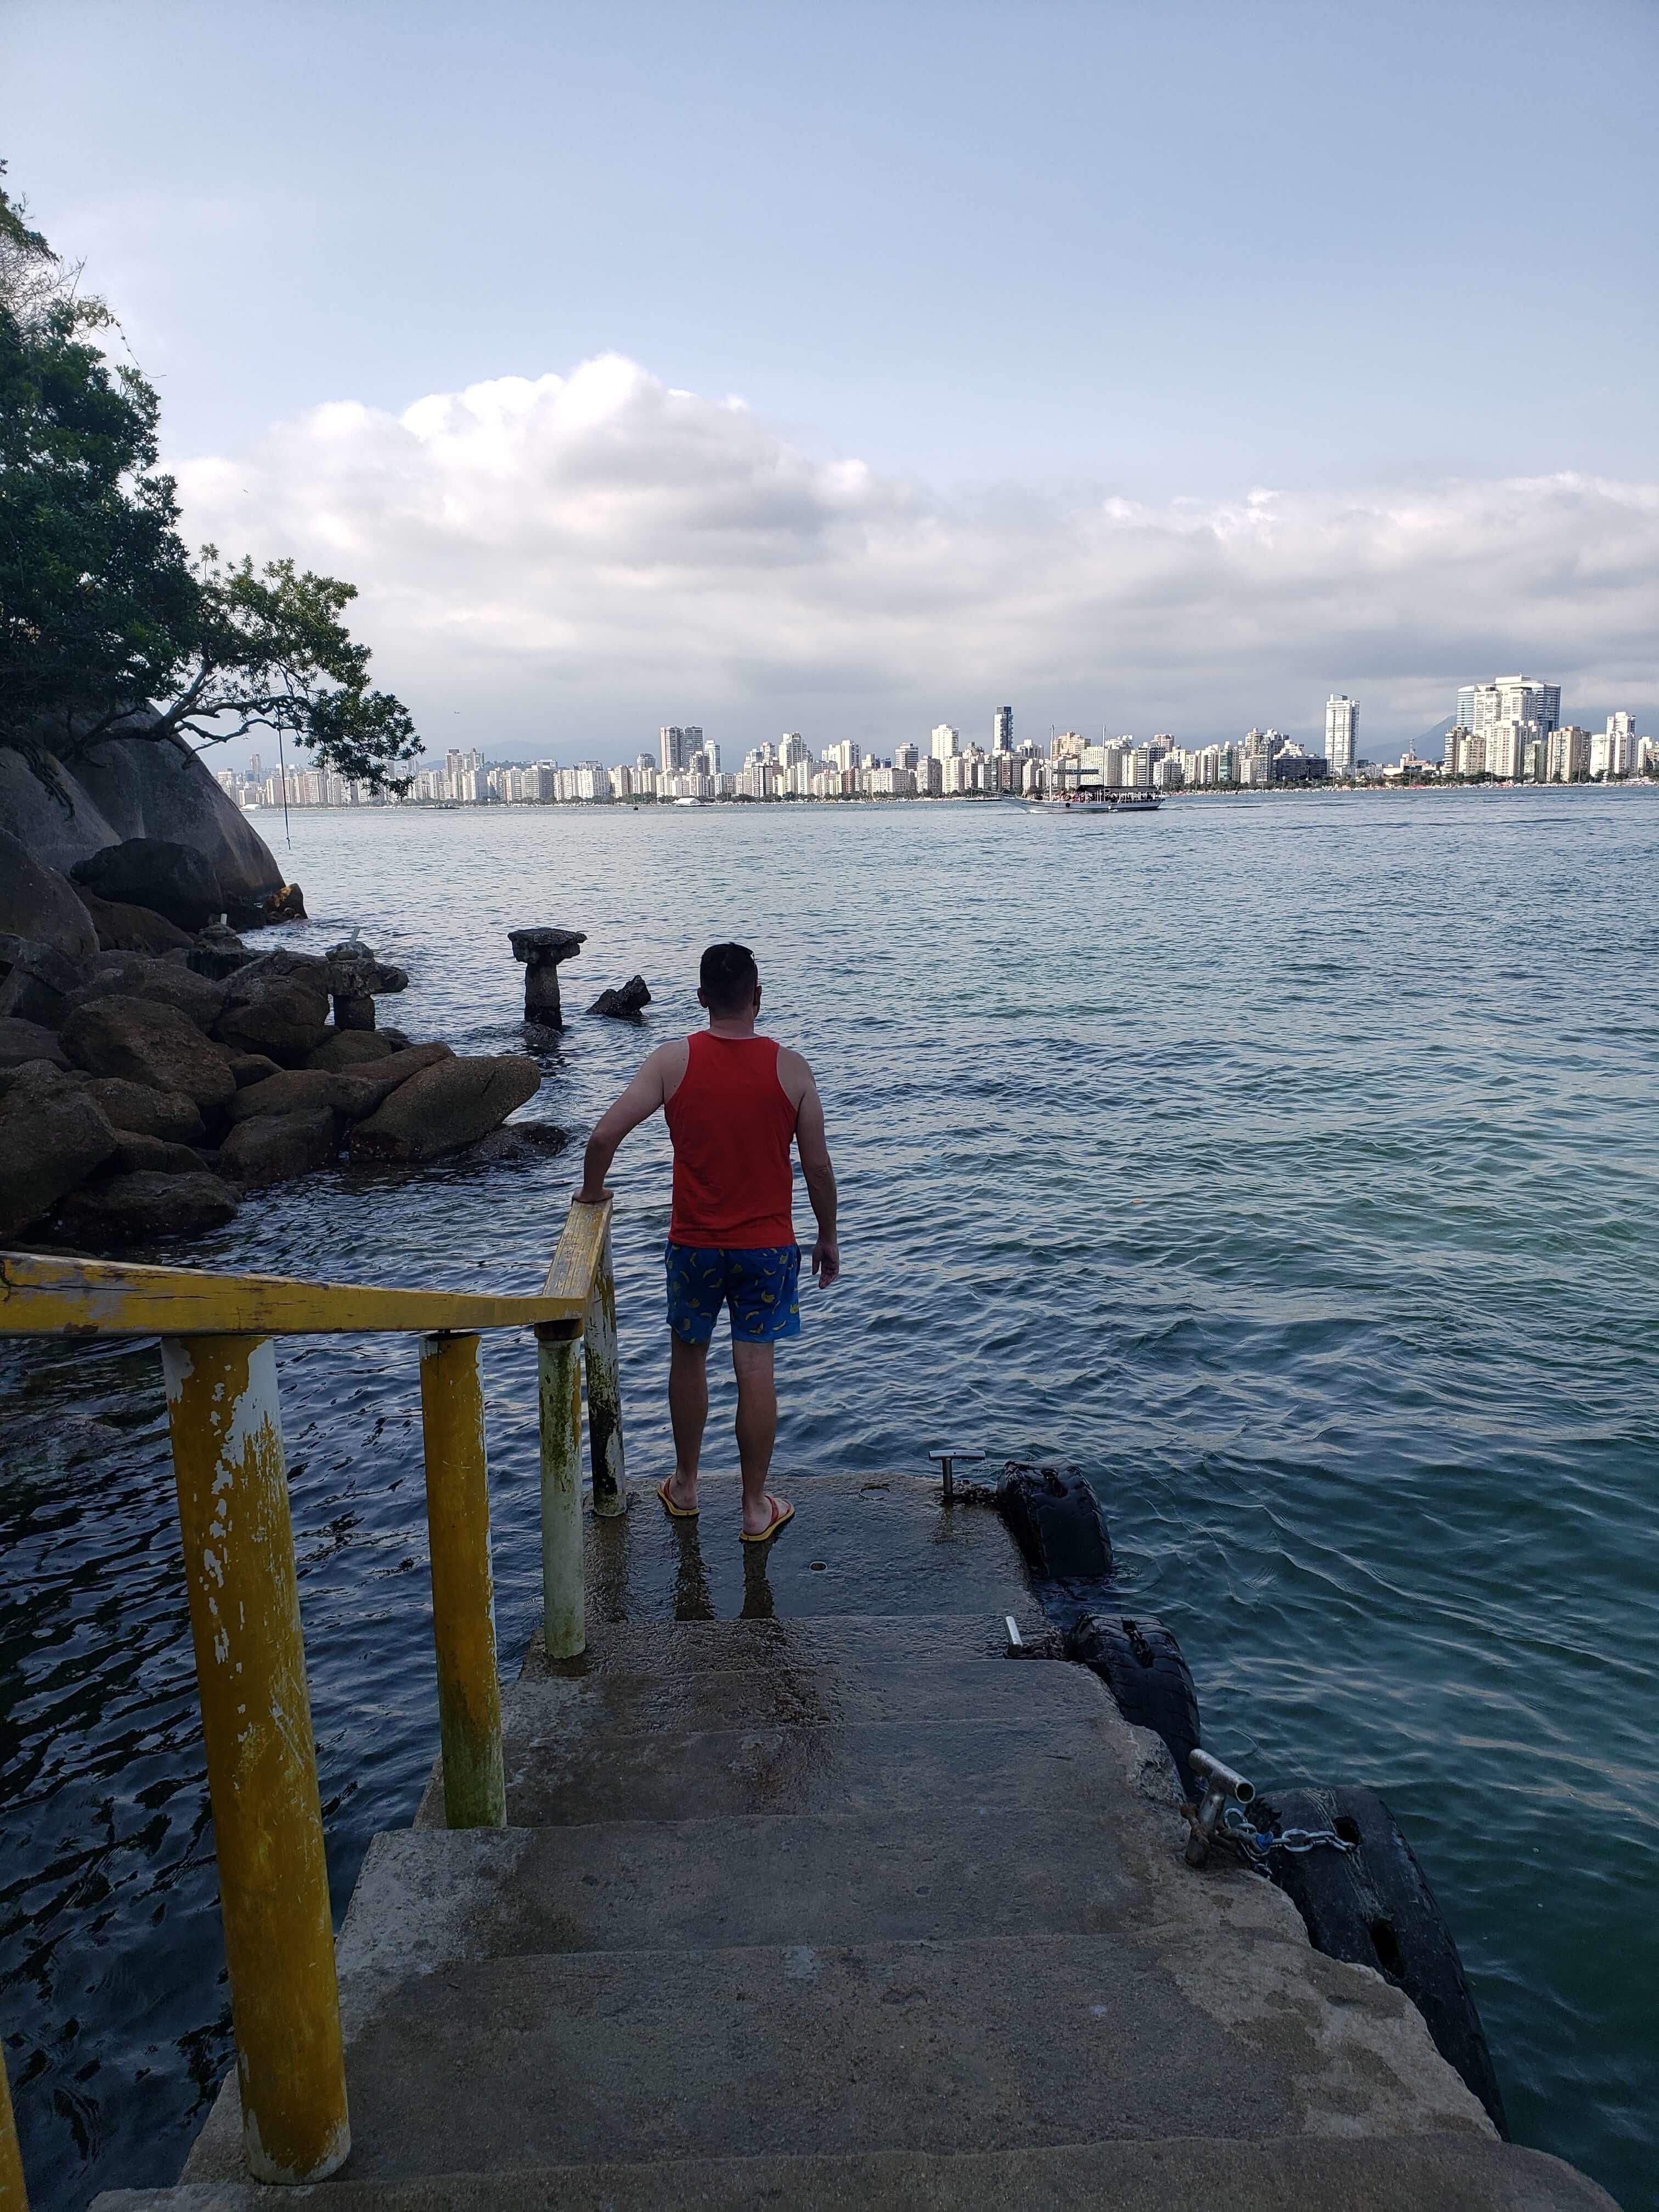 Orla de Santos